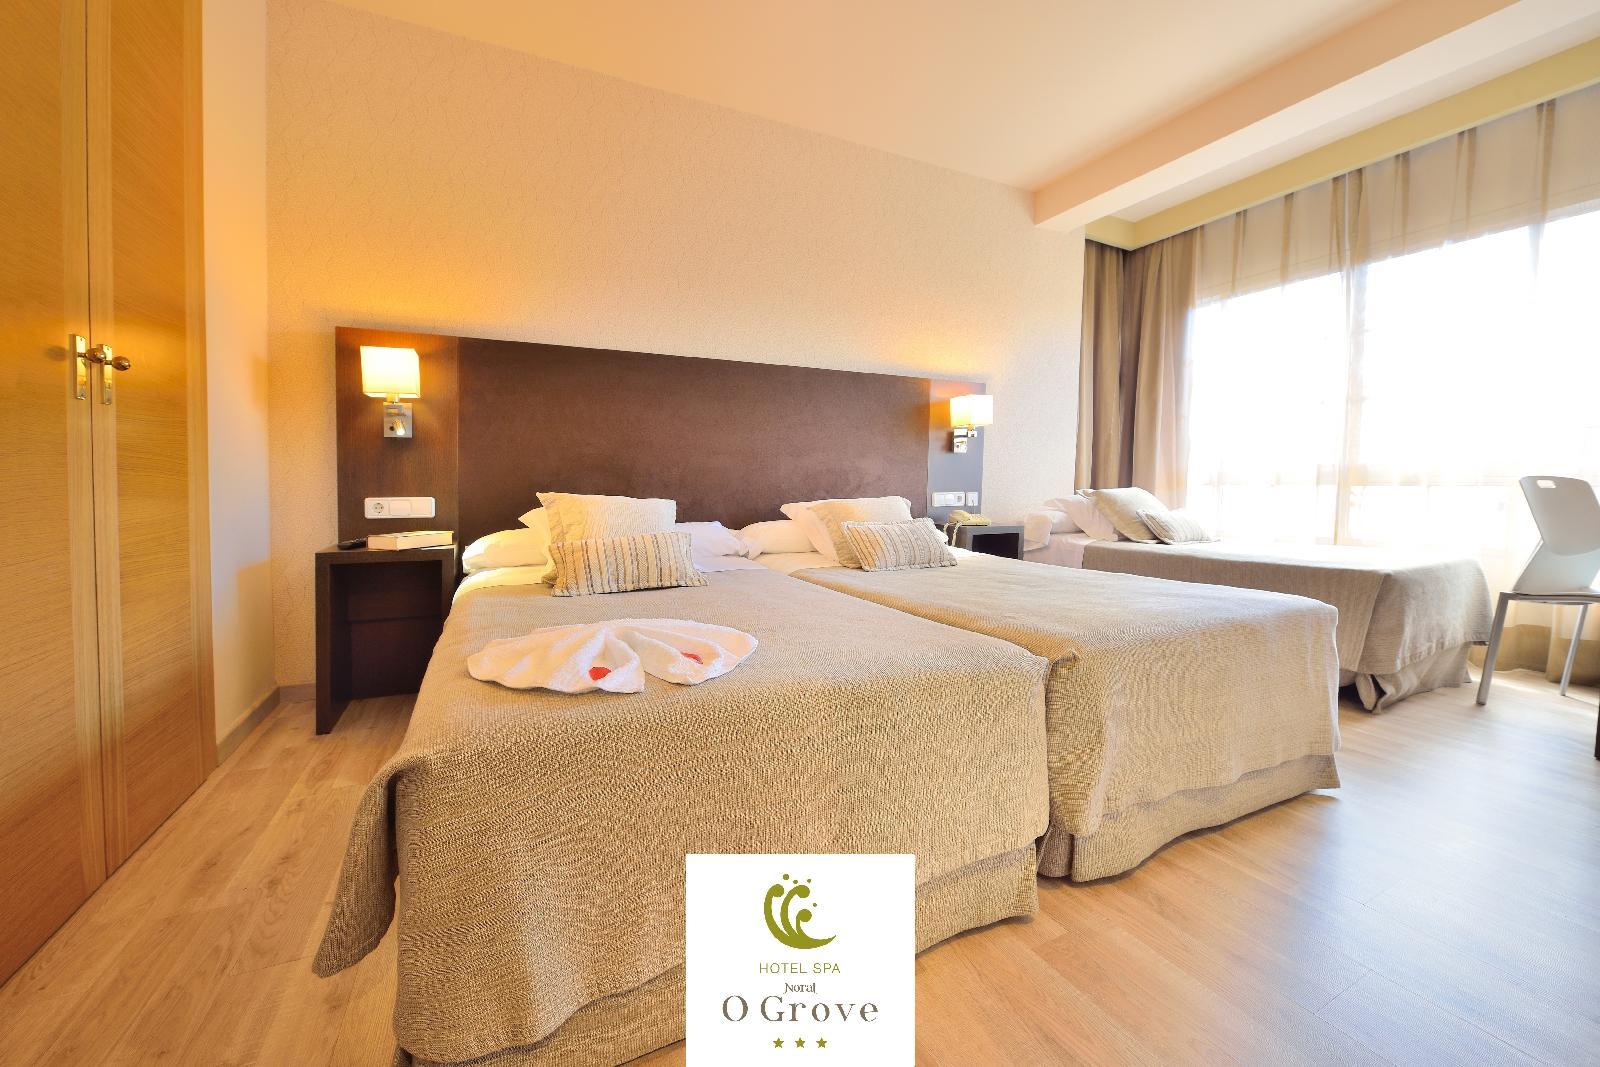 10. Hotel Spa Norat O Grove